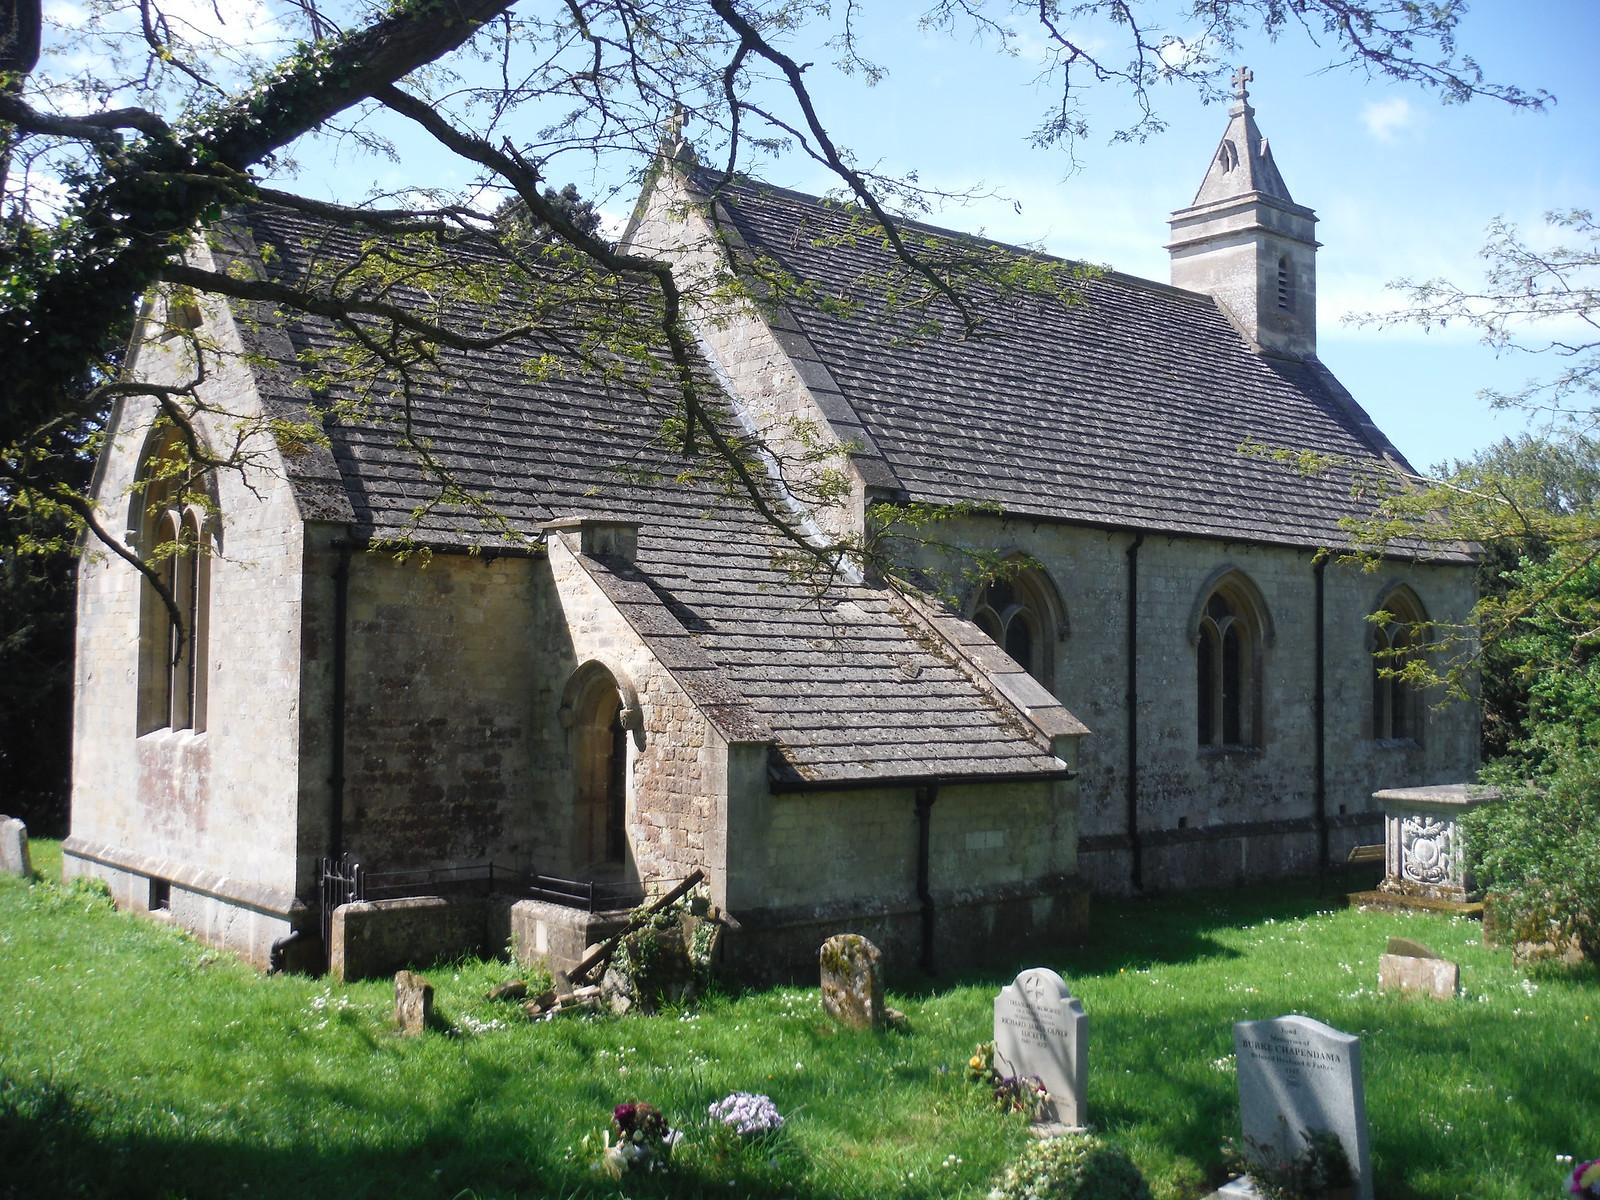 St. Helen's Church, Albury SWC Walk 190 - Thame Circular